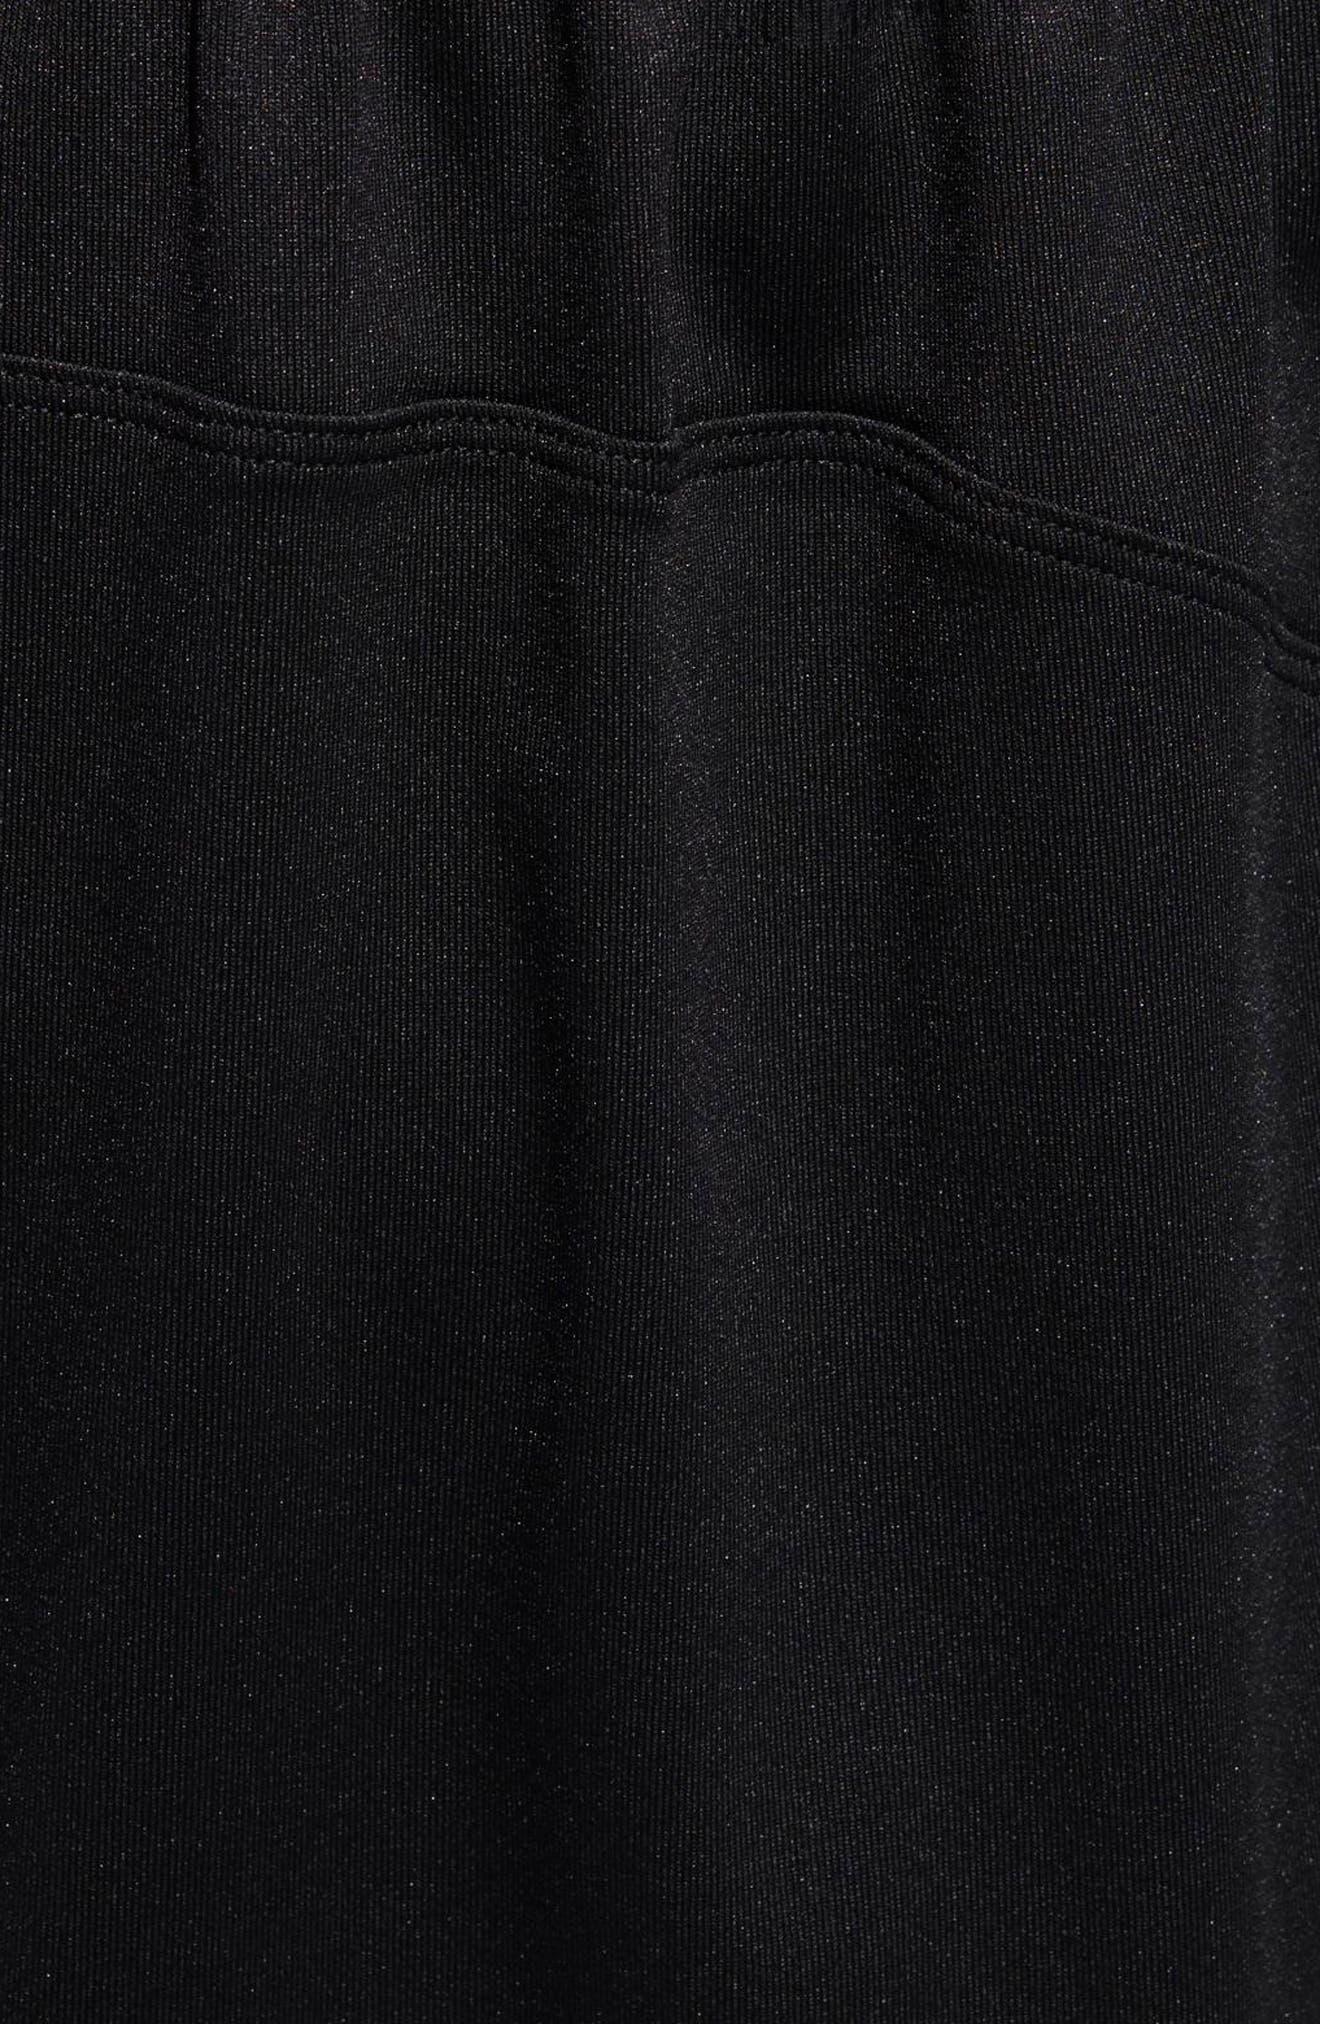 SB Hype Icon Shorts,                             Alternate thumbnail 3, color,                             001